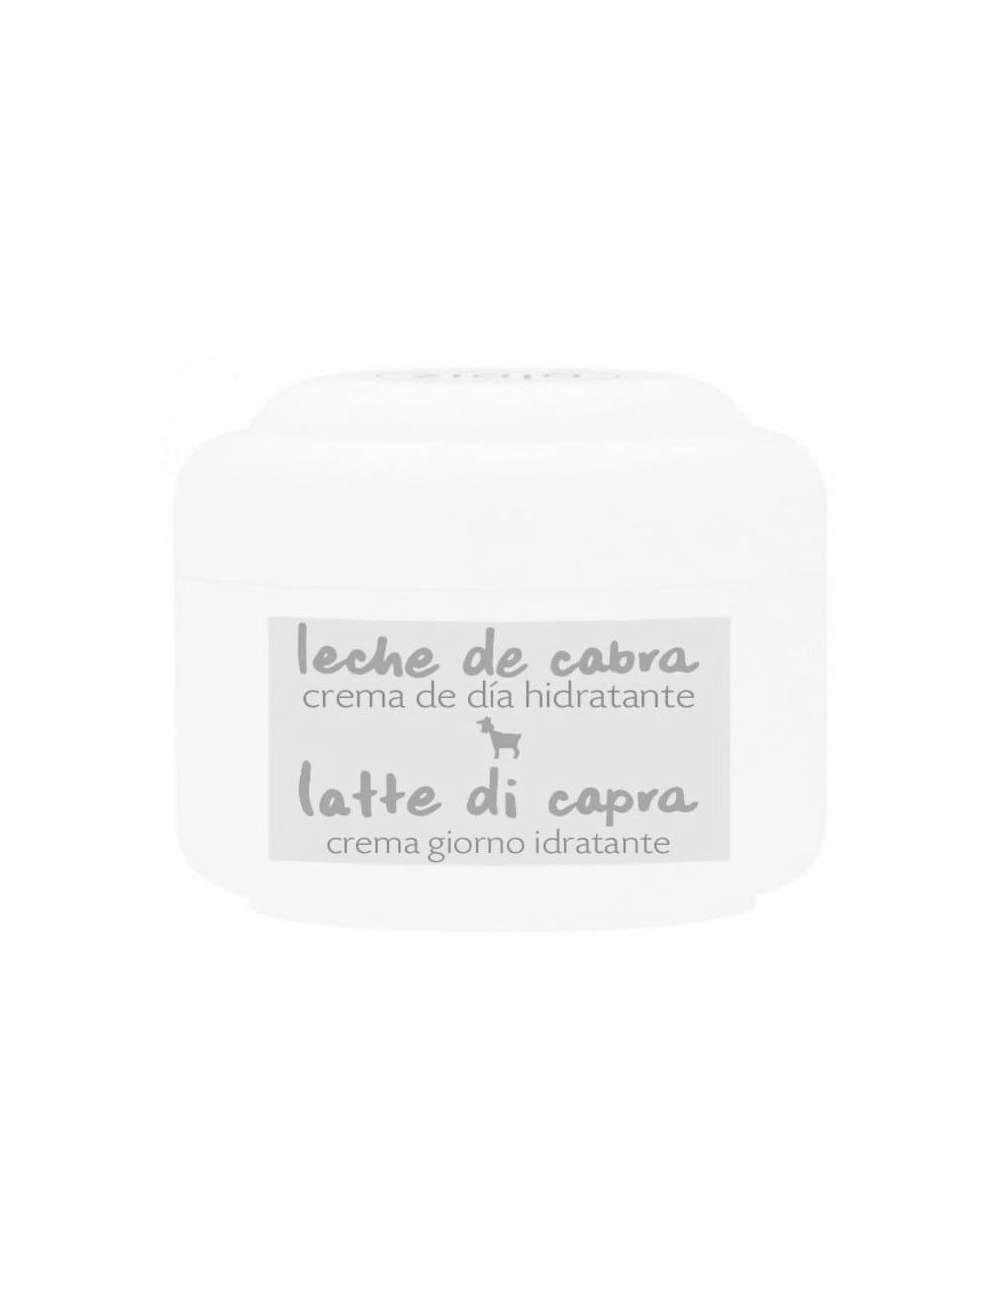 Crema Facial de Día Natural de Leche de Cabra. Ziaja.